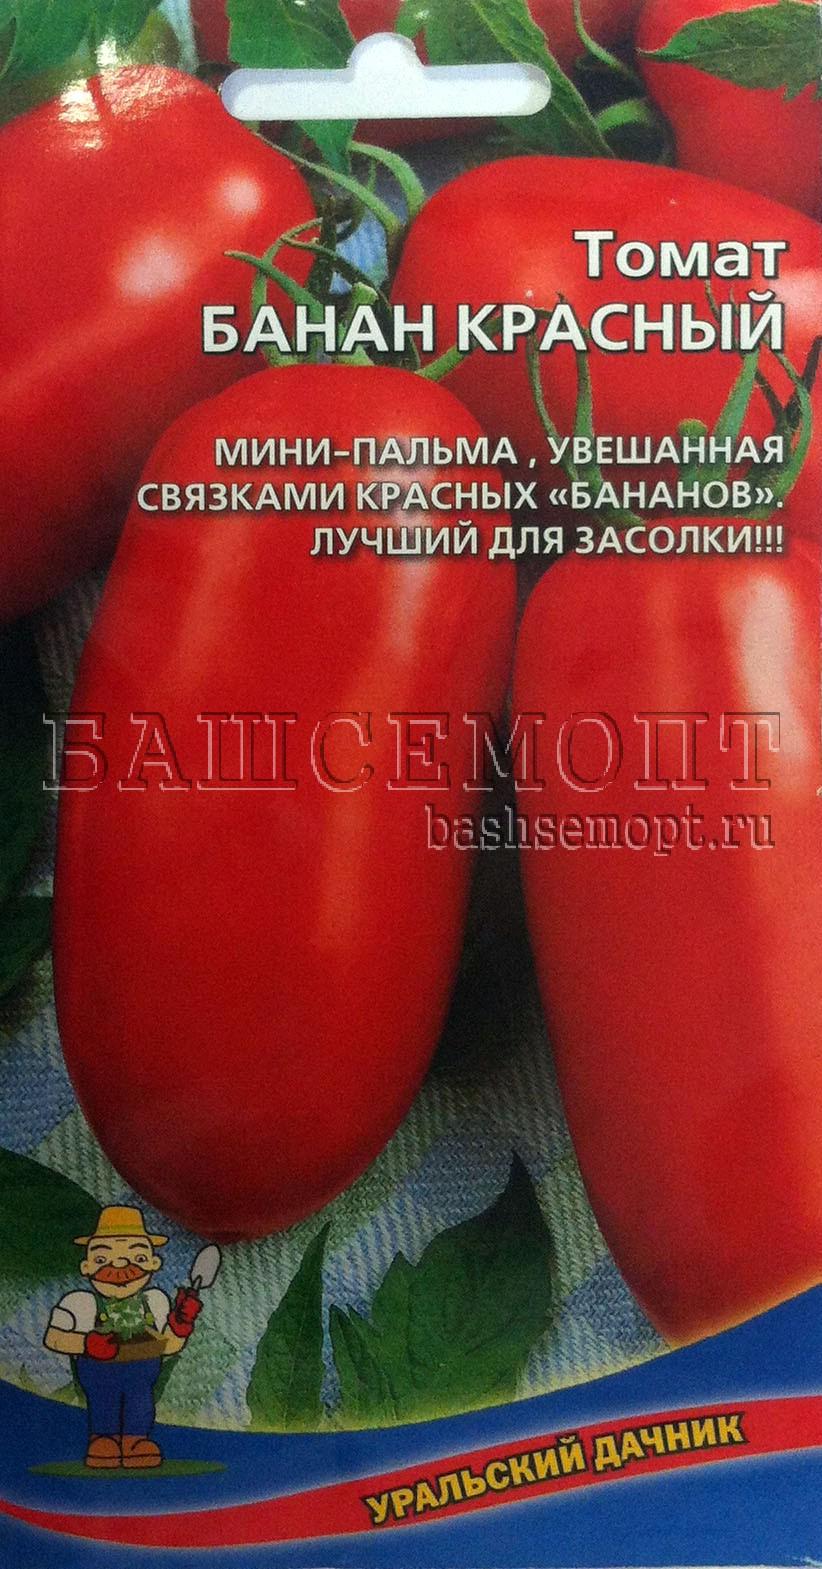 Томат «банан красный». описание сорта и характеристика урожайности помидора (фото)